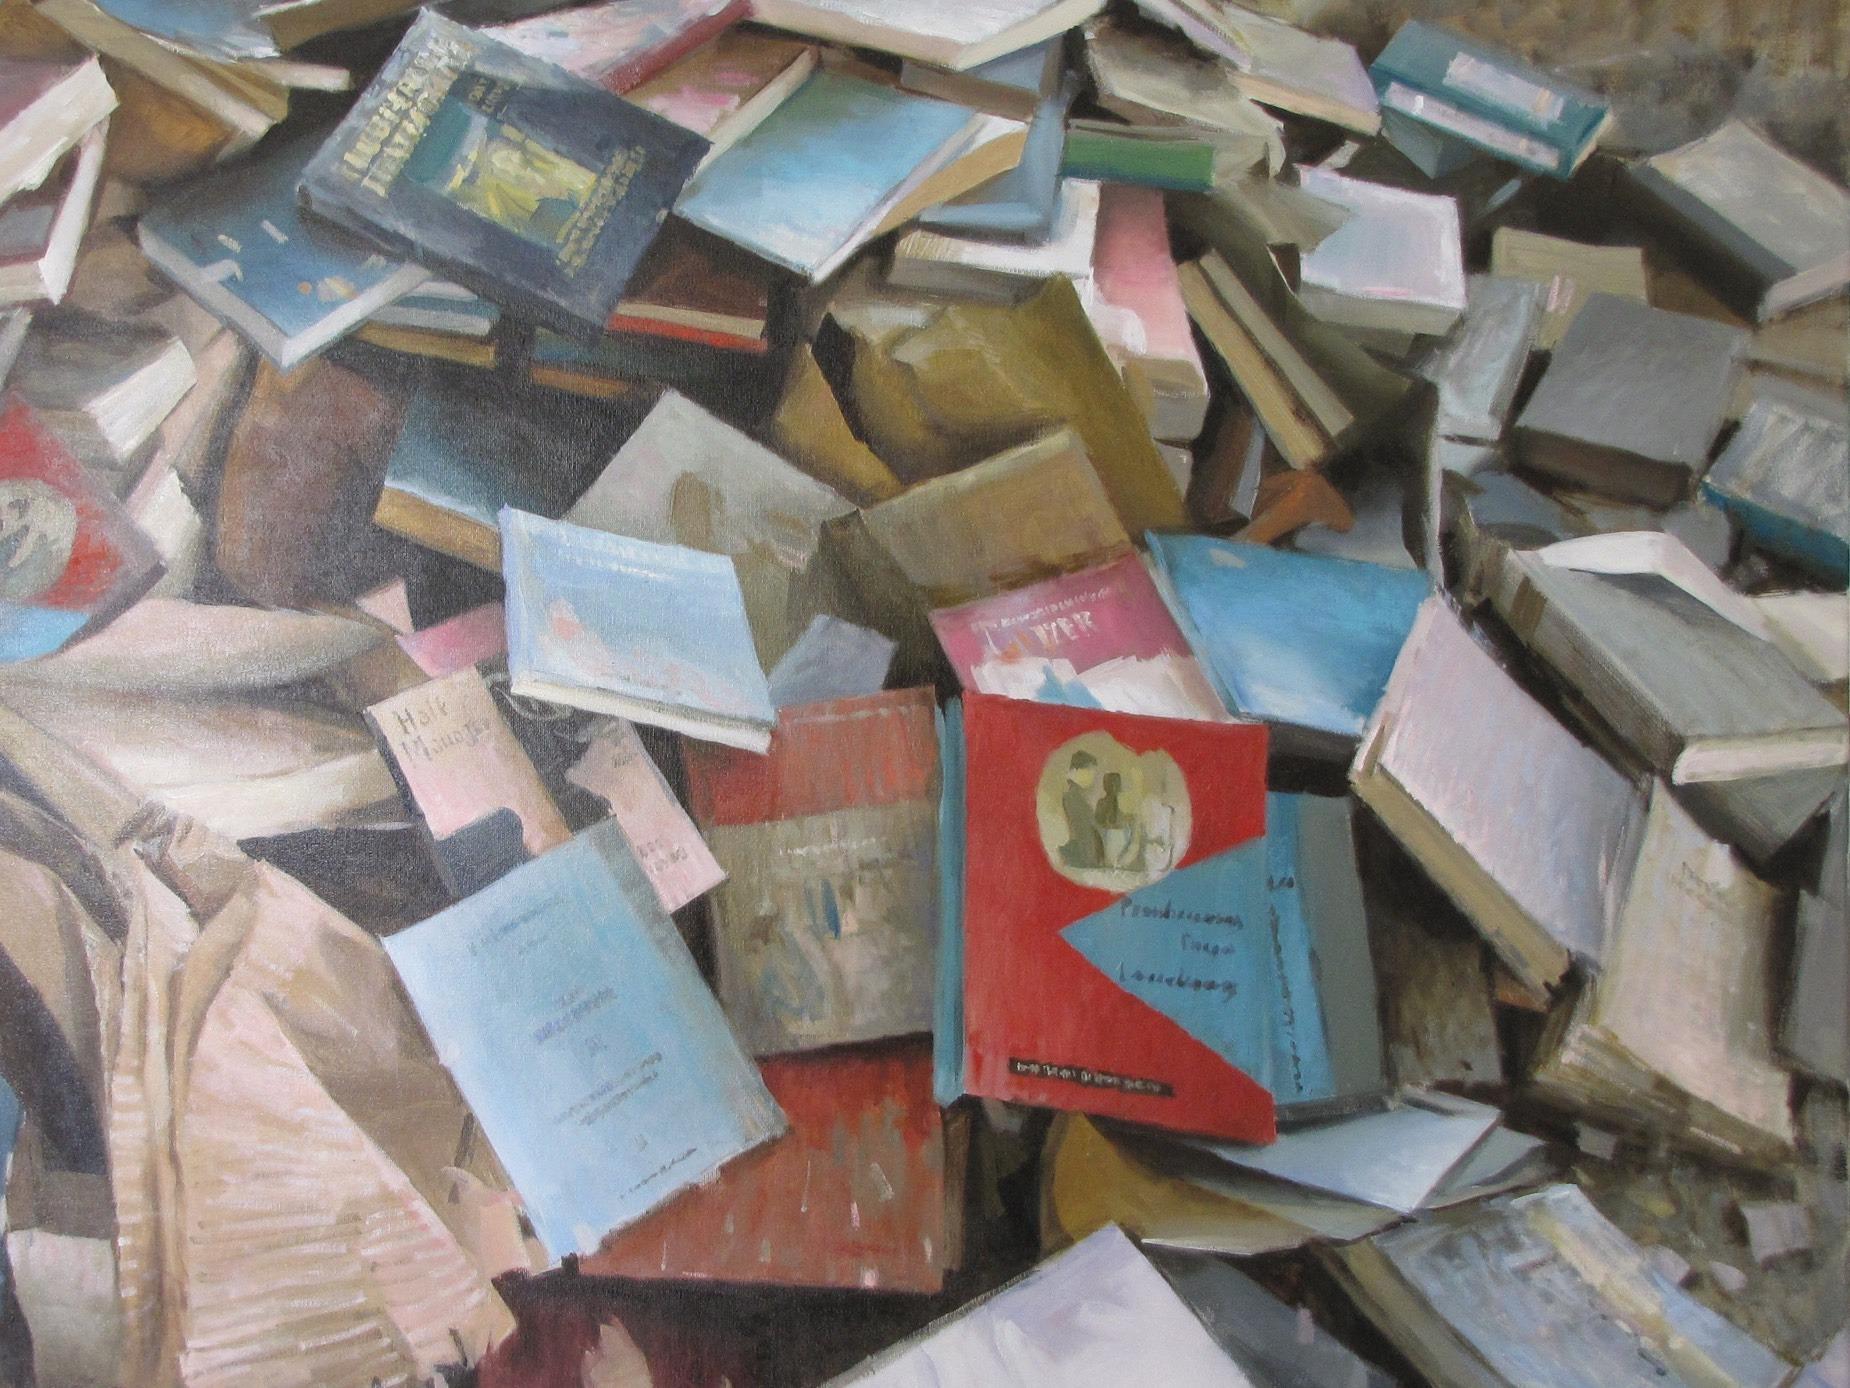 Book Paintings: i dipinti di libri di Andrea Mancini